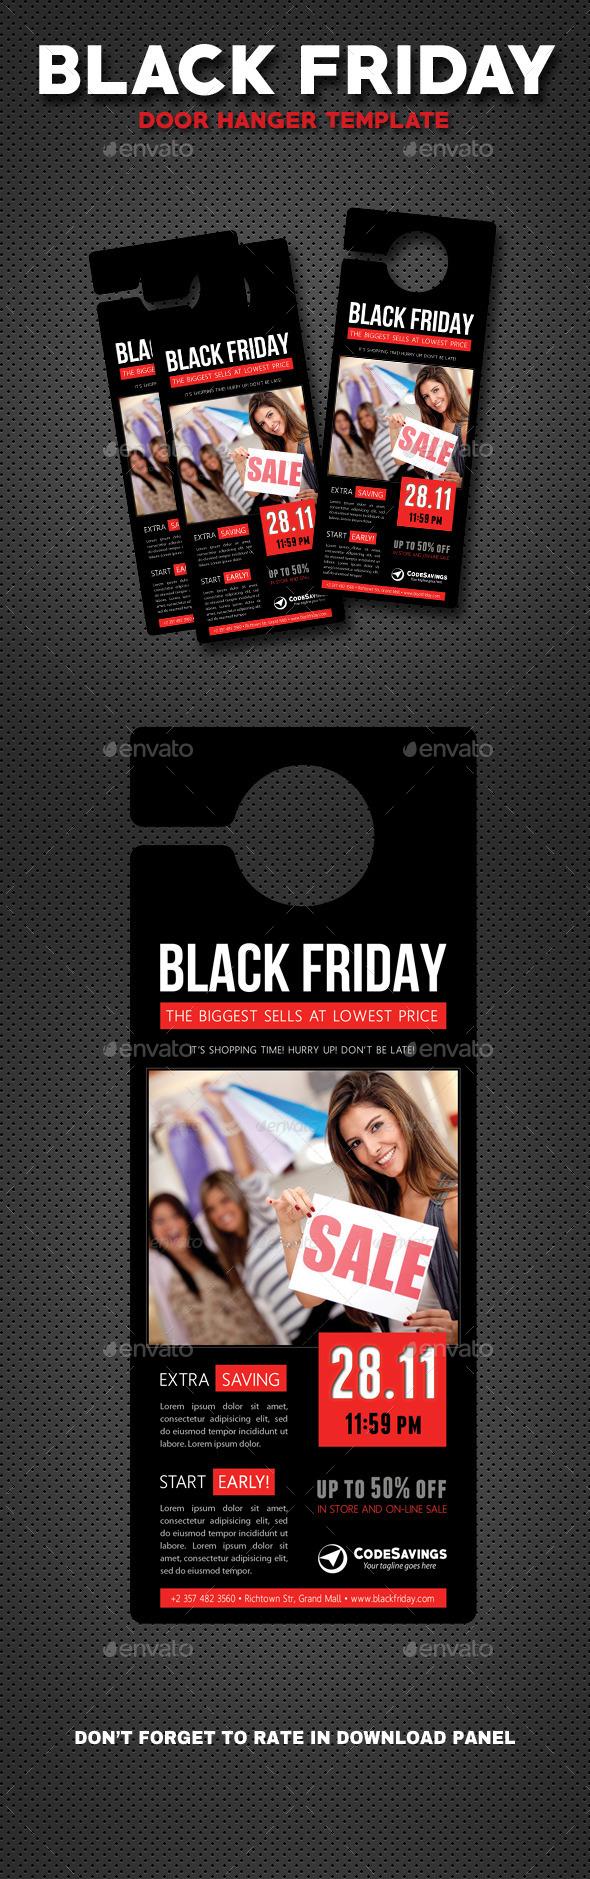 Black Friday Door Hanger V2 - Miscellaneous Print Templates